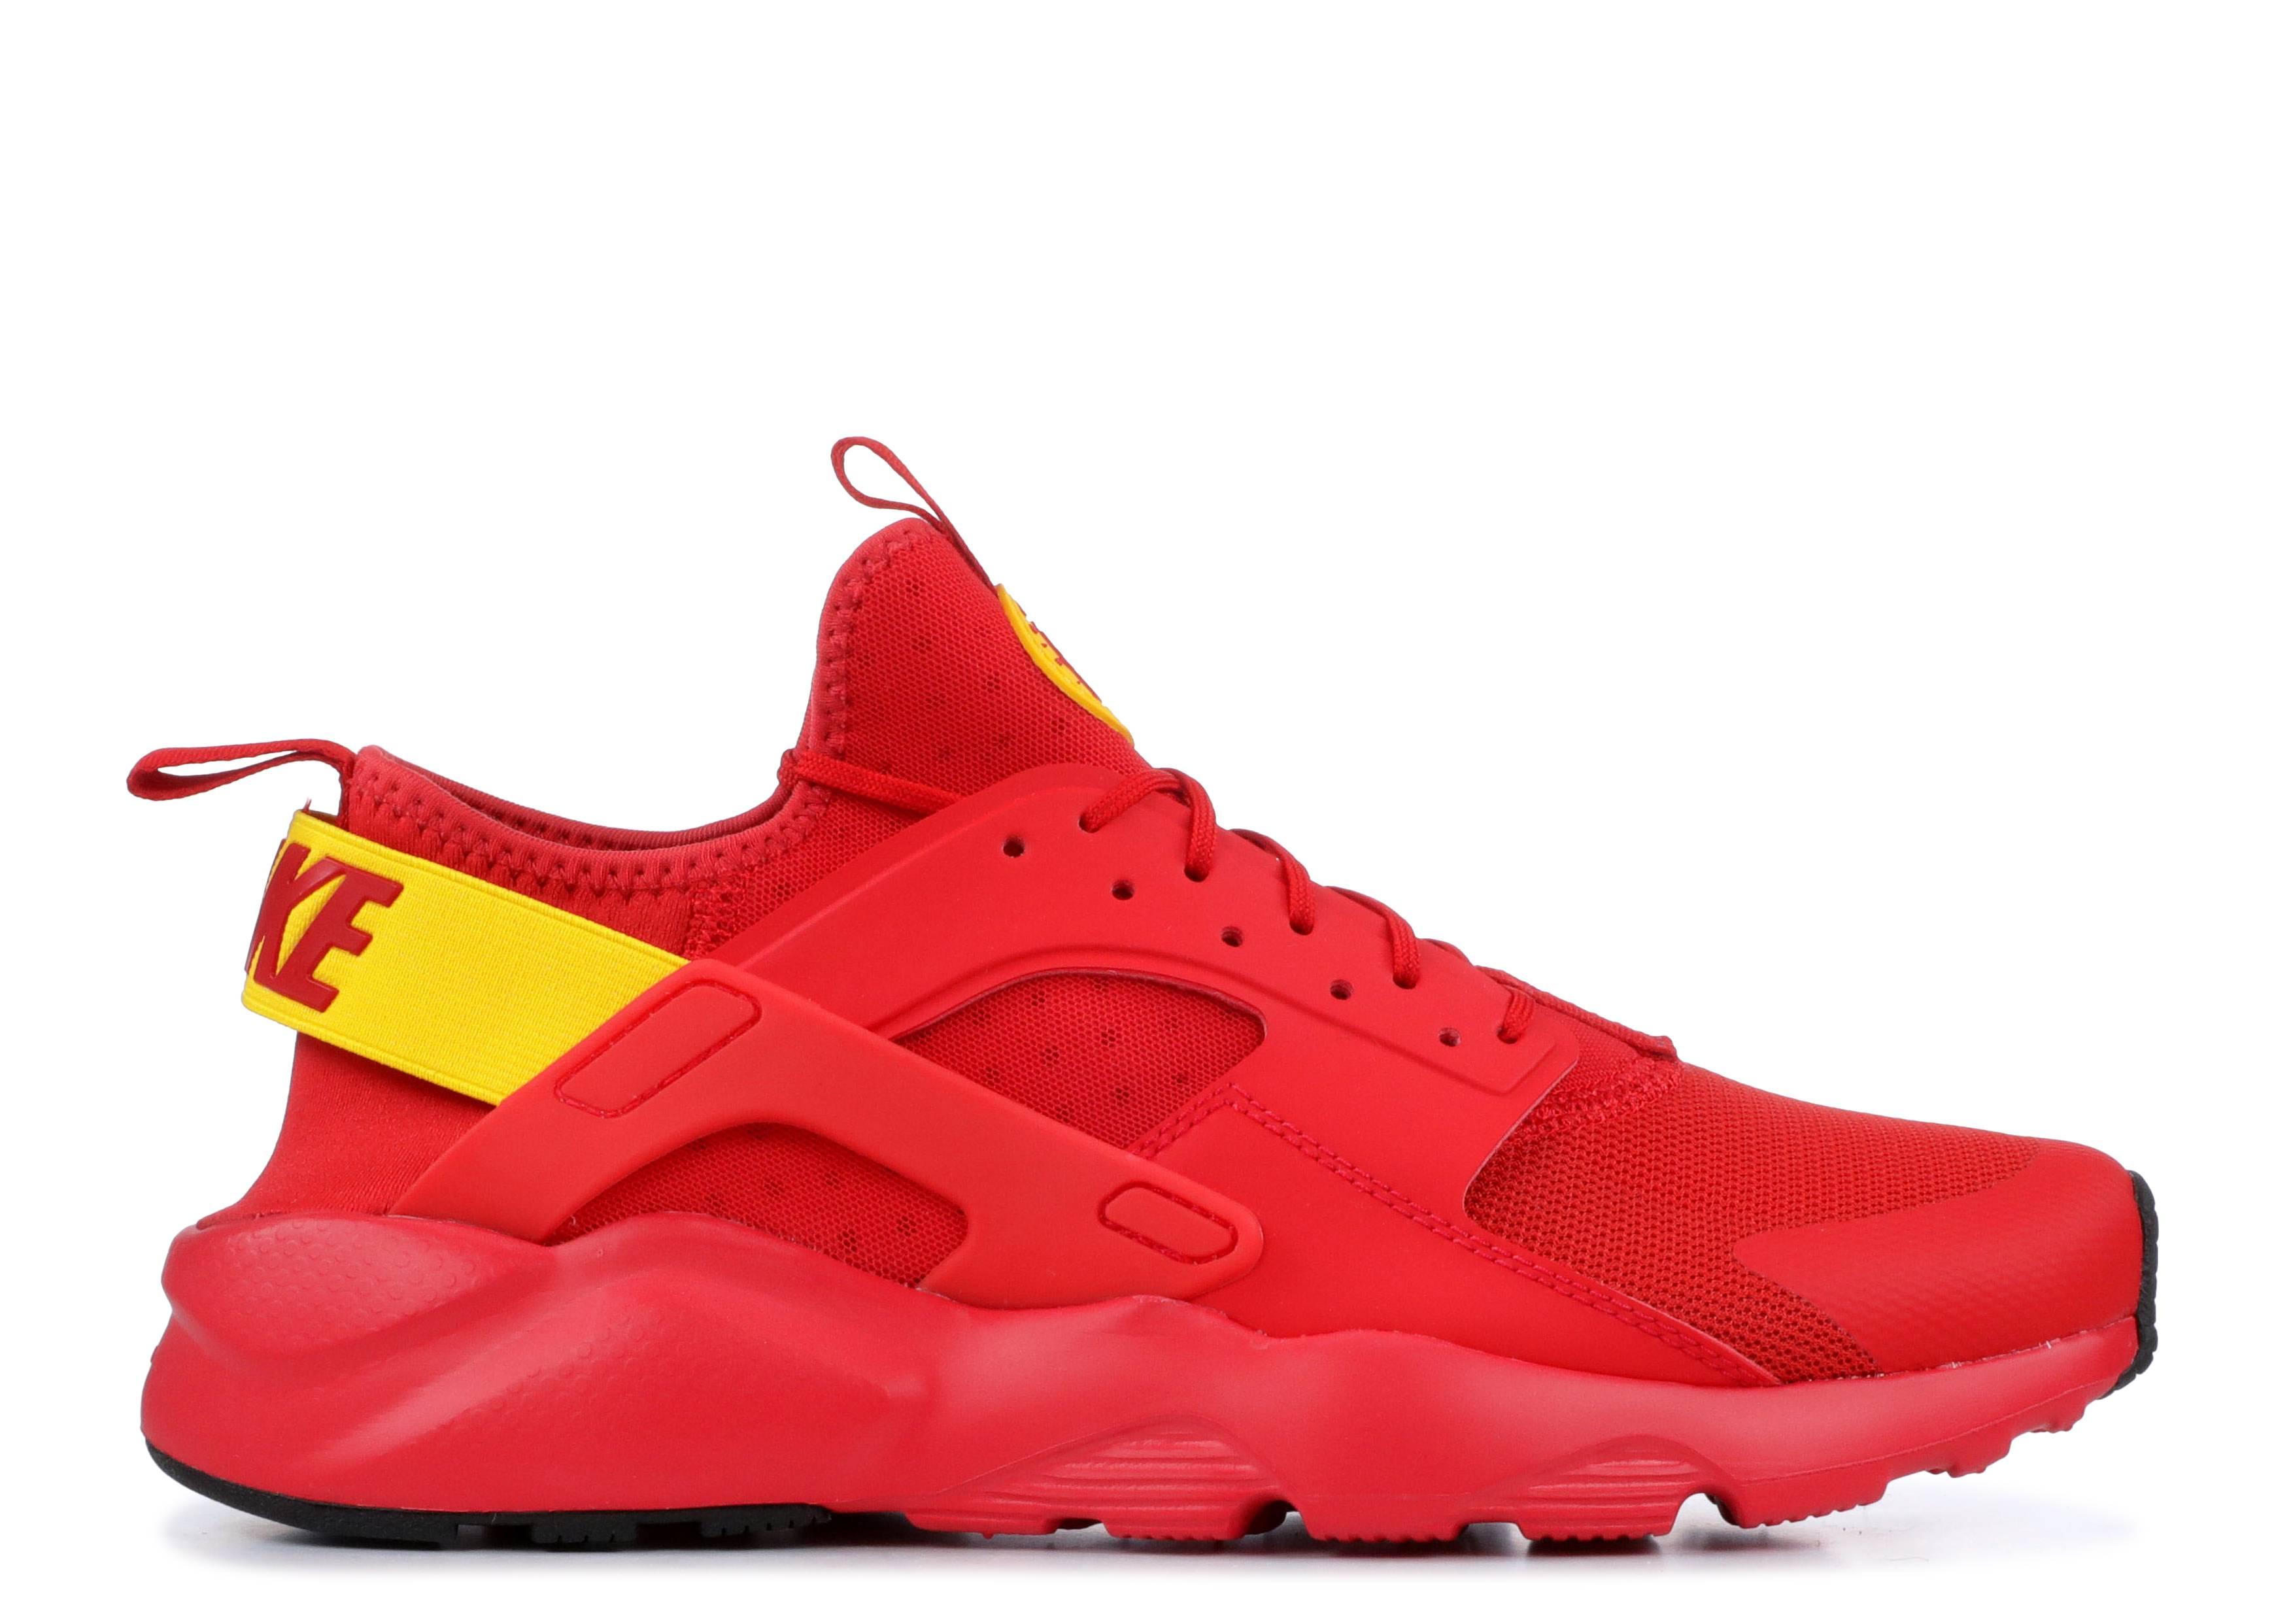 Nike Air Huarache Run Ultra Mens 819685 607 Red Amarillo Running Shoes Size 8